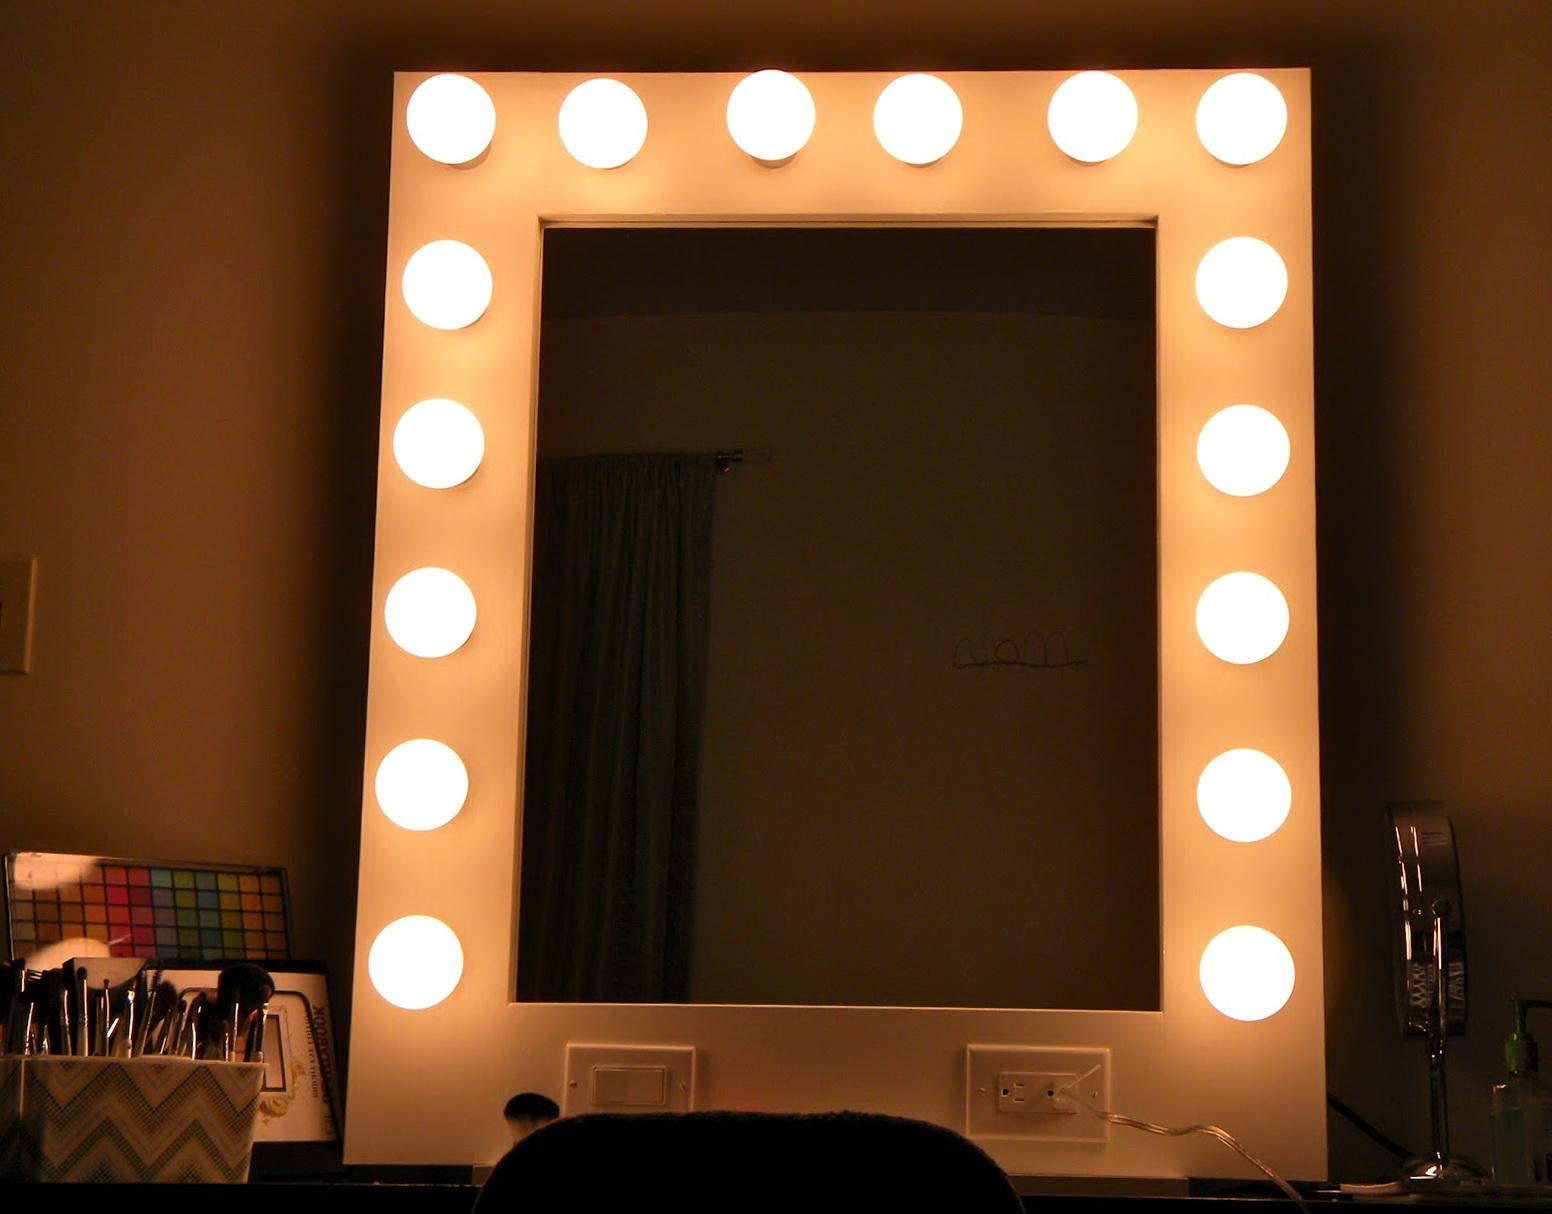 Vanity Mirror With Lights Uk